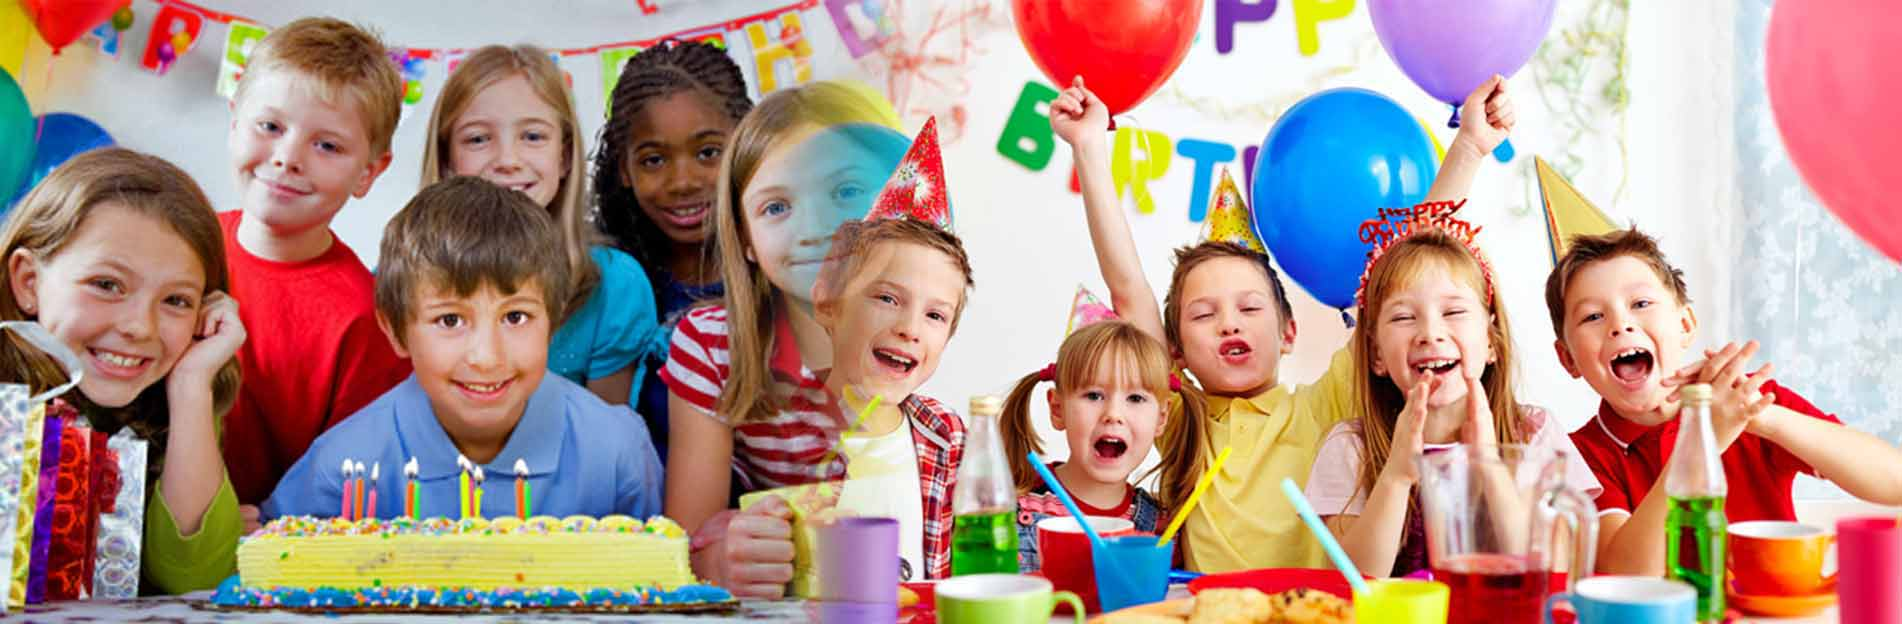 Birthday Partys 4 Kids